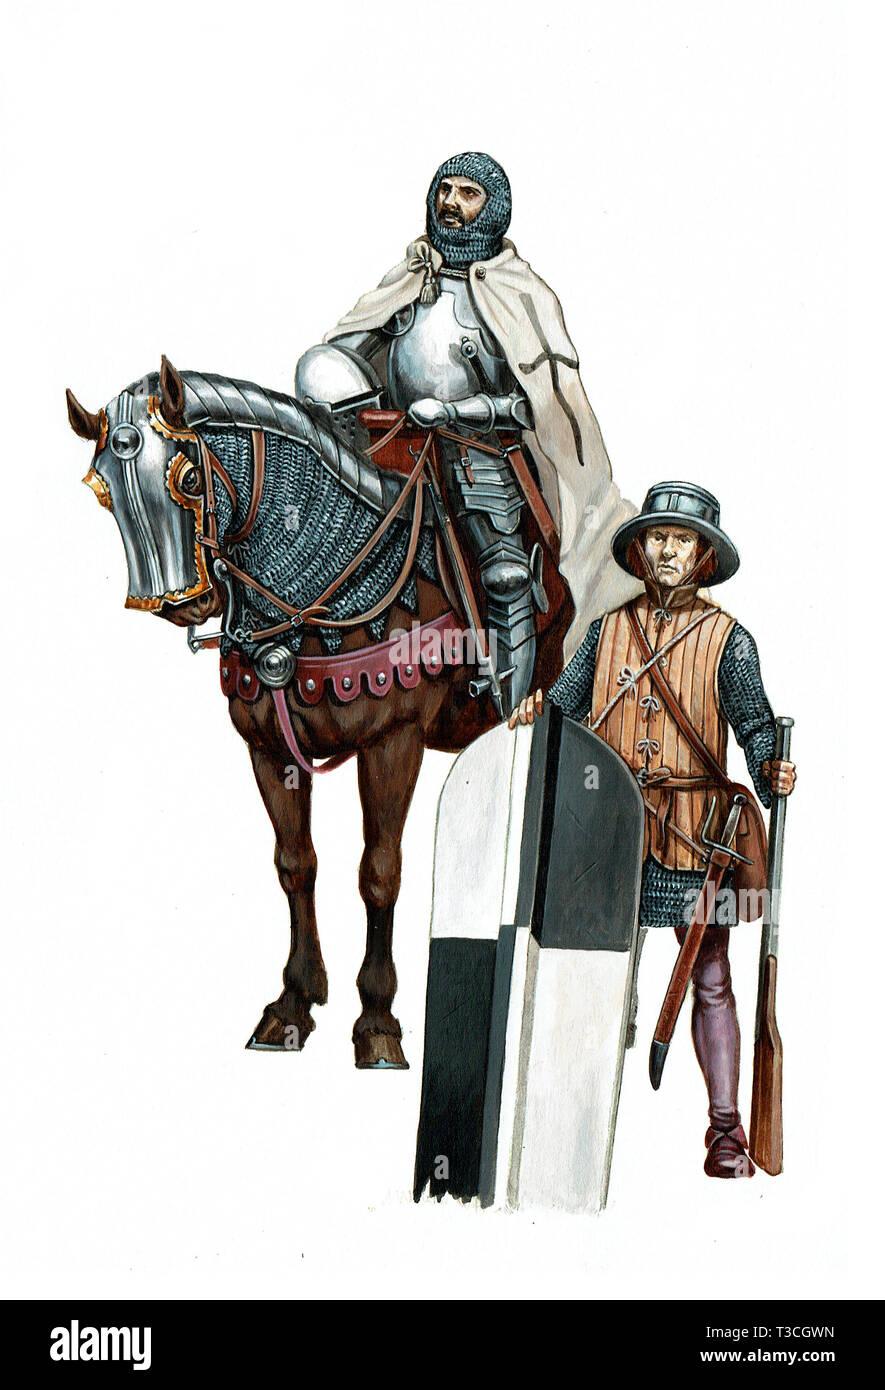 Heavy armoured teutonic knight illustration. Mounted knight with mercenary. - Stock Image